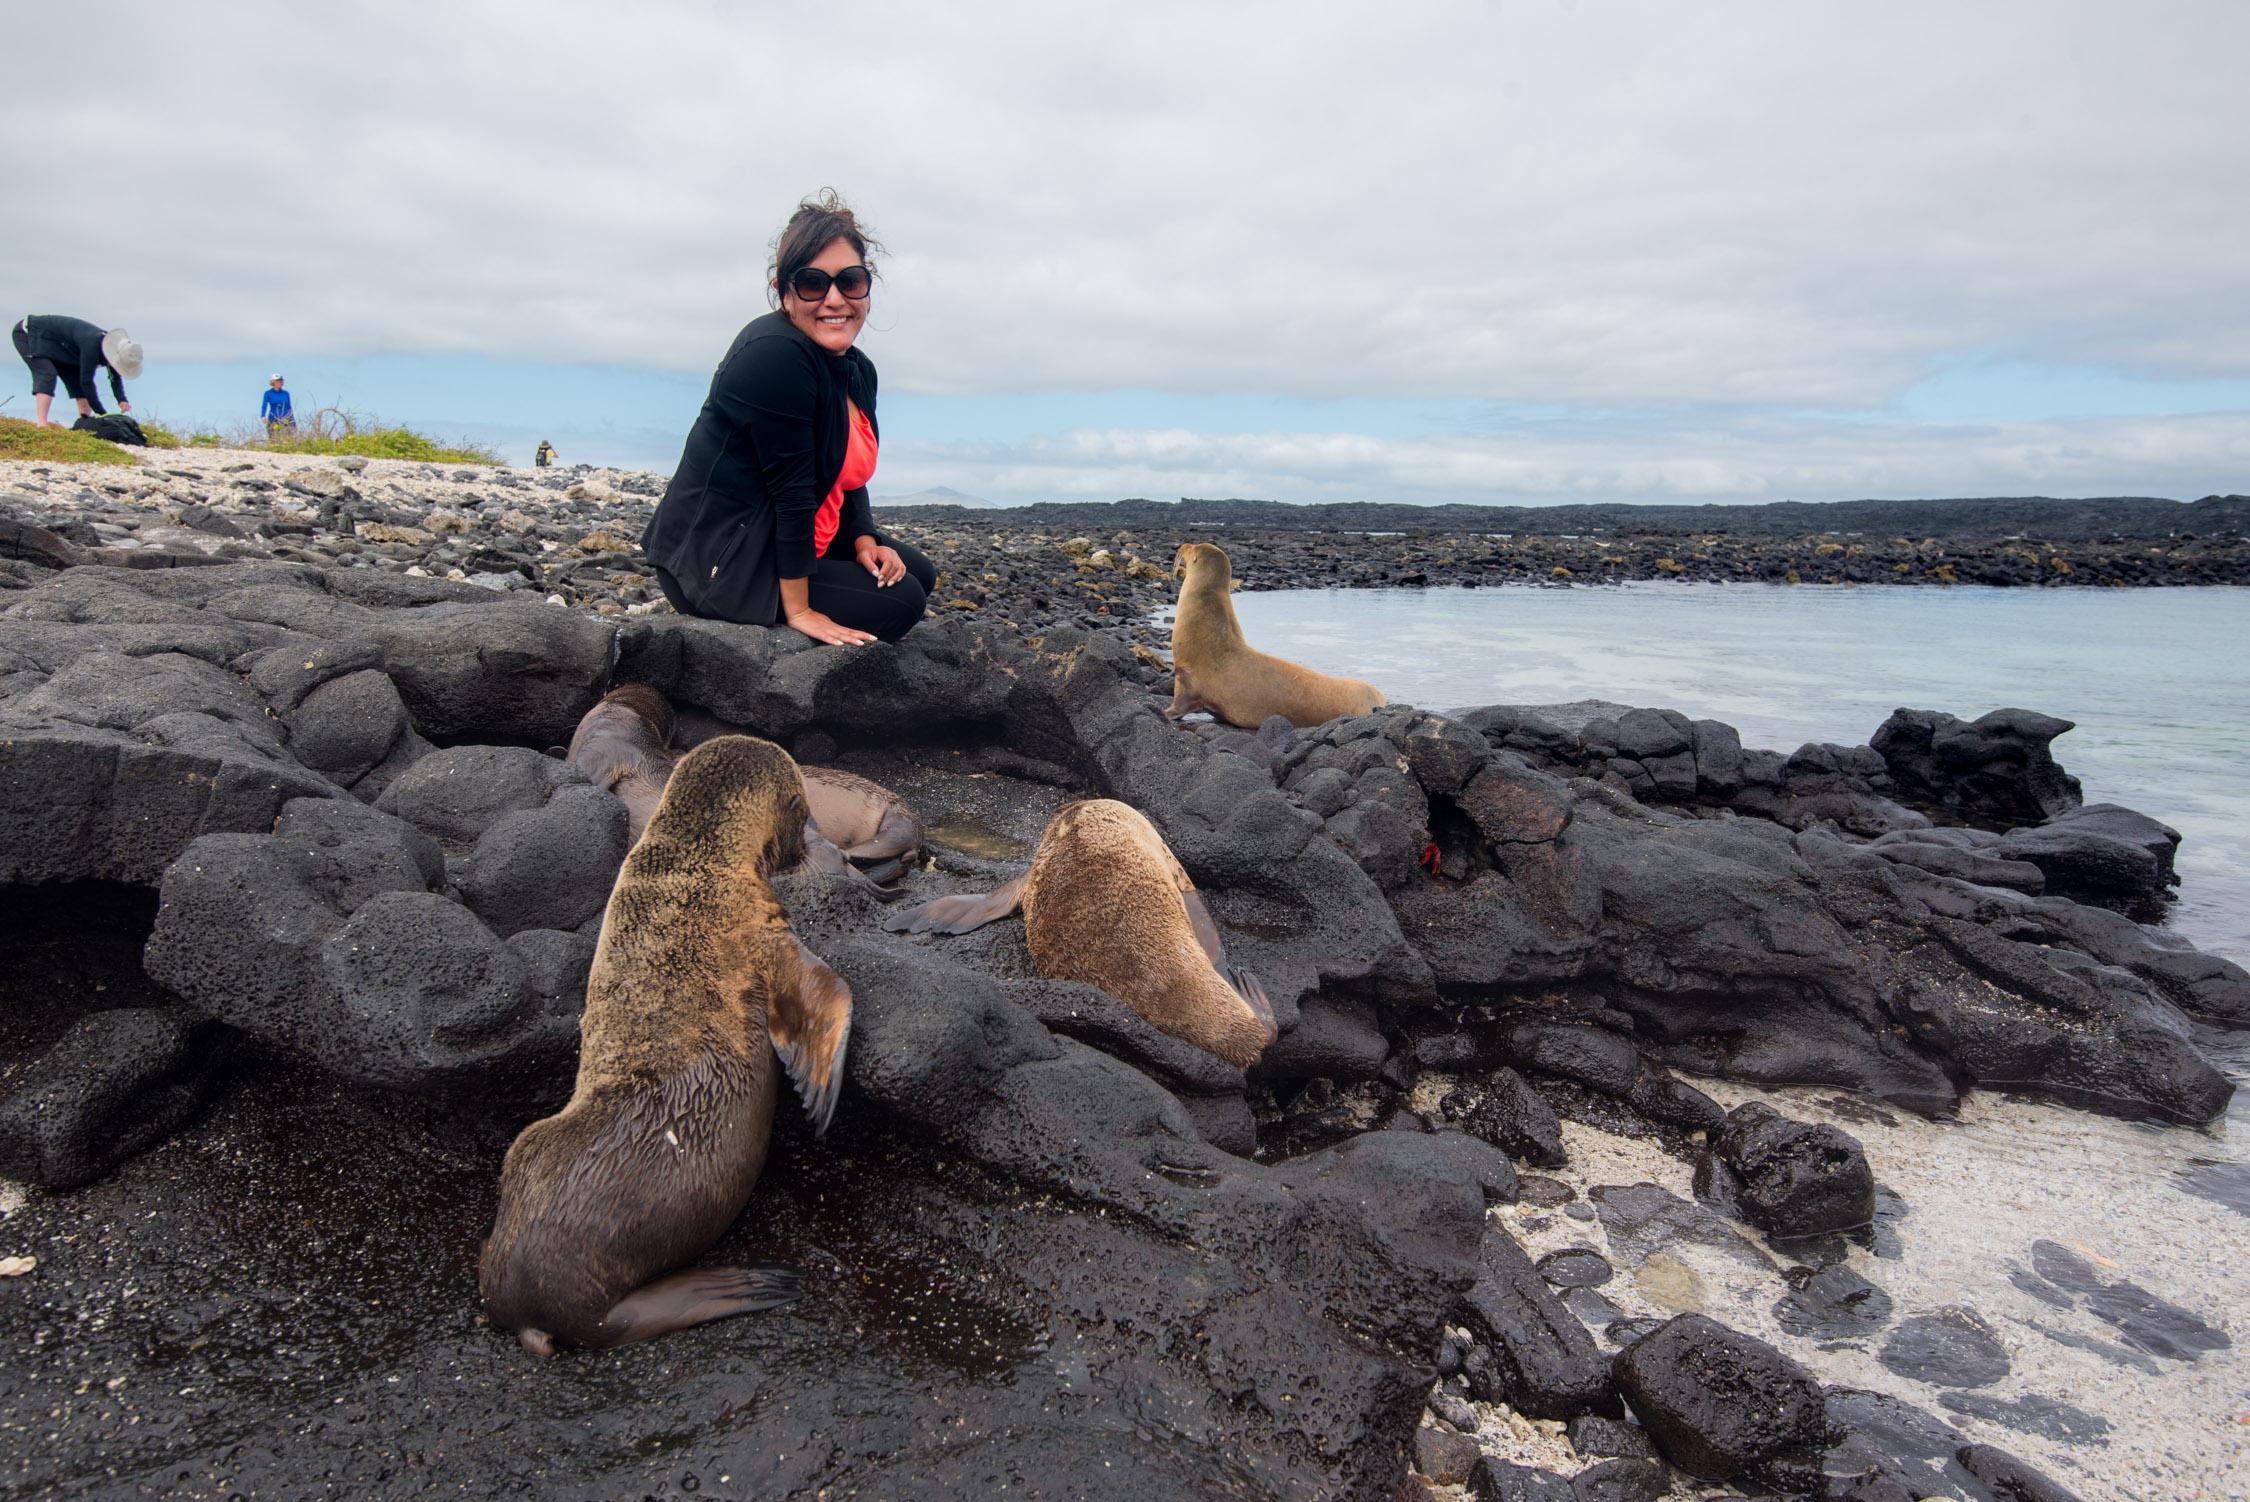 Danika making friends in the Galápagos Islands